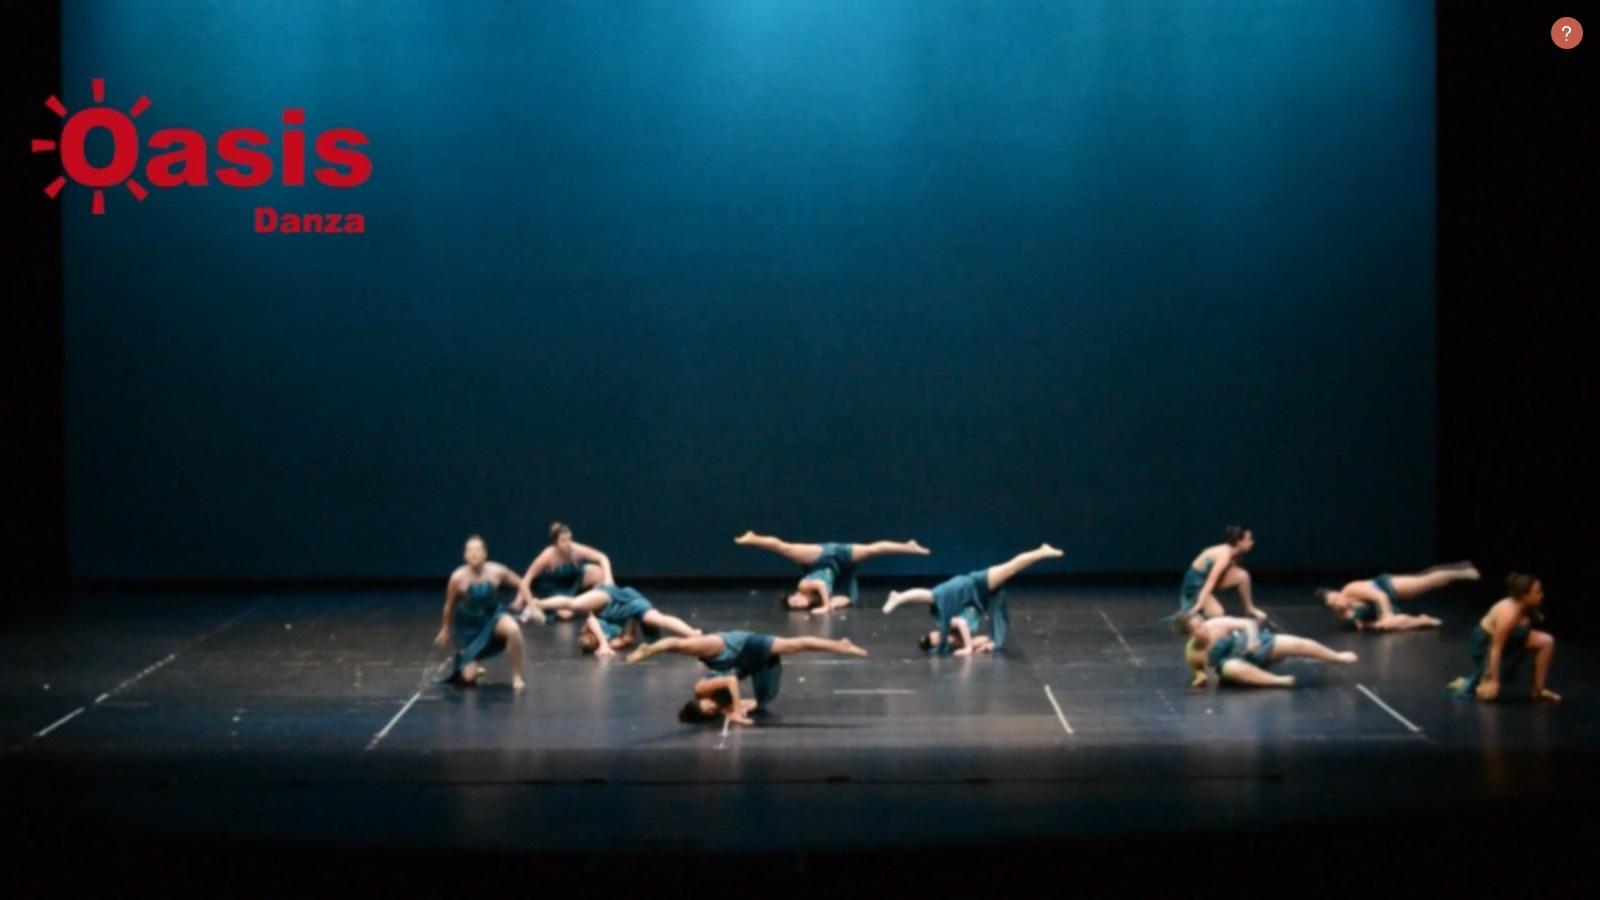 portada del video danza moderna